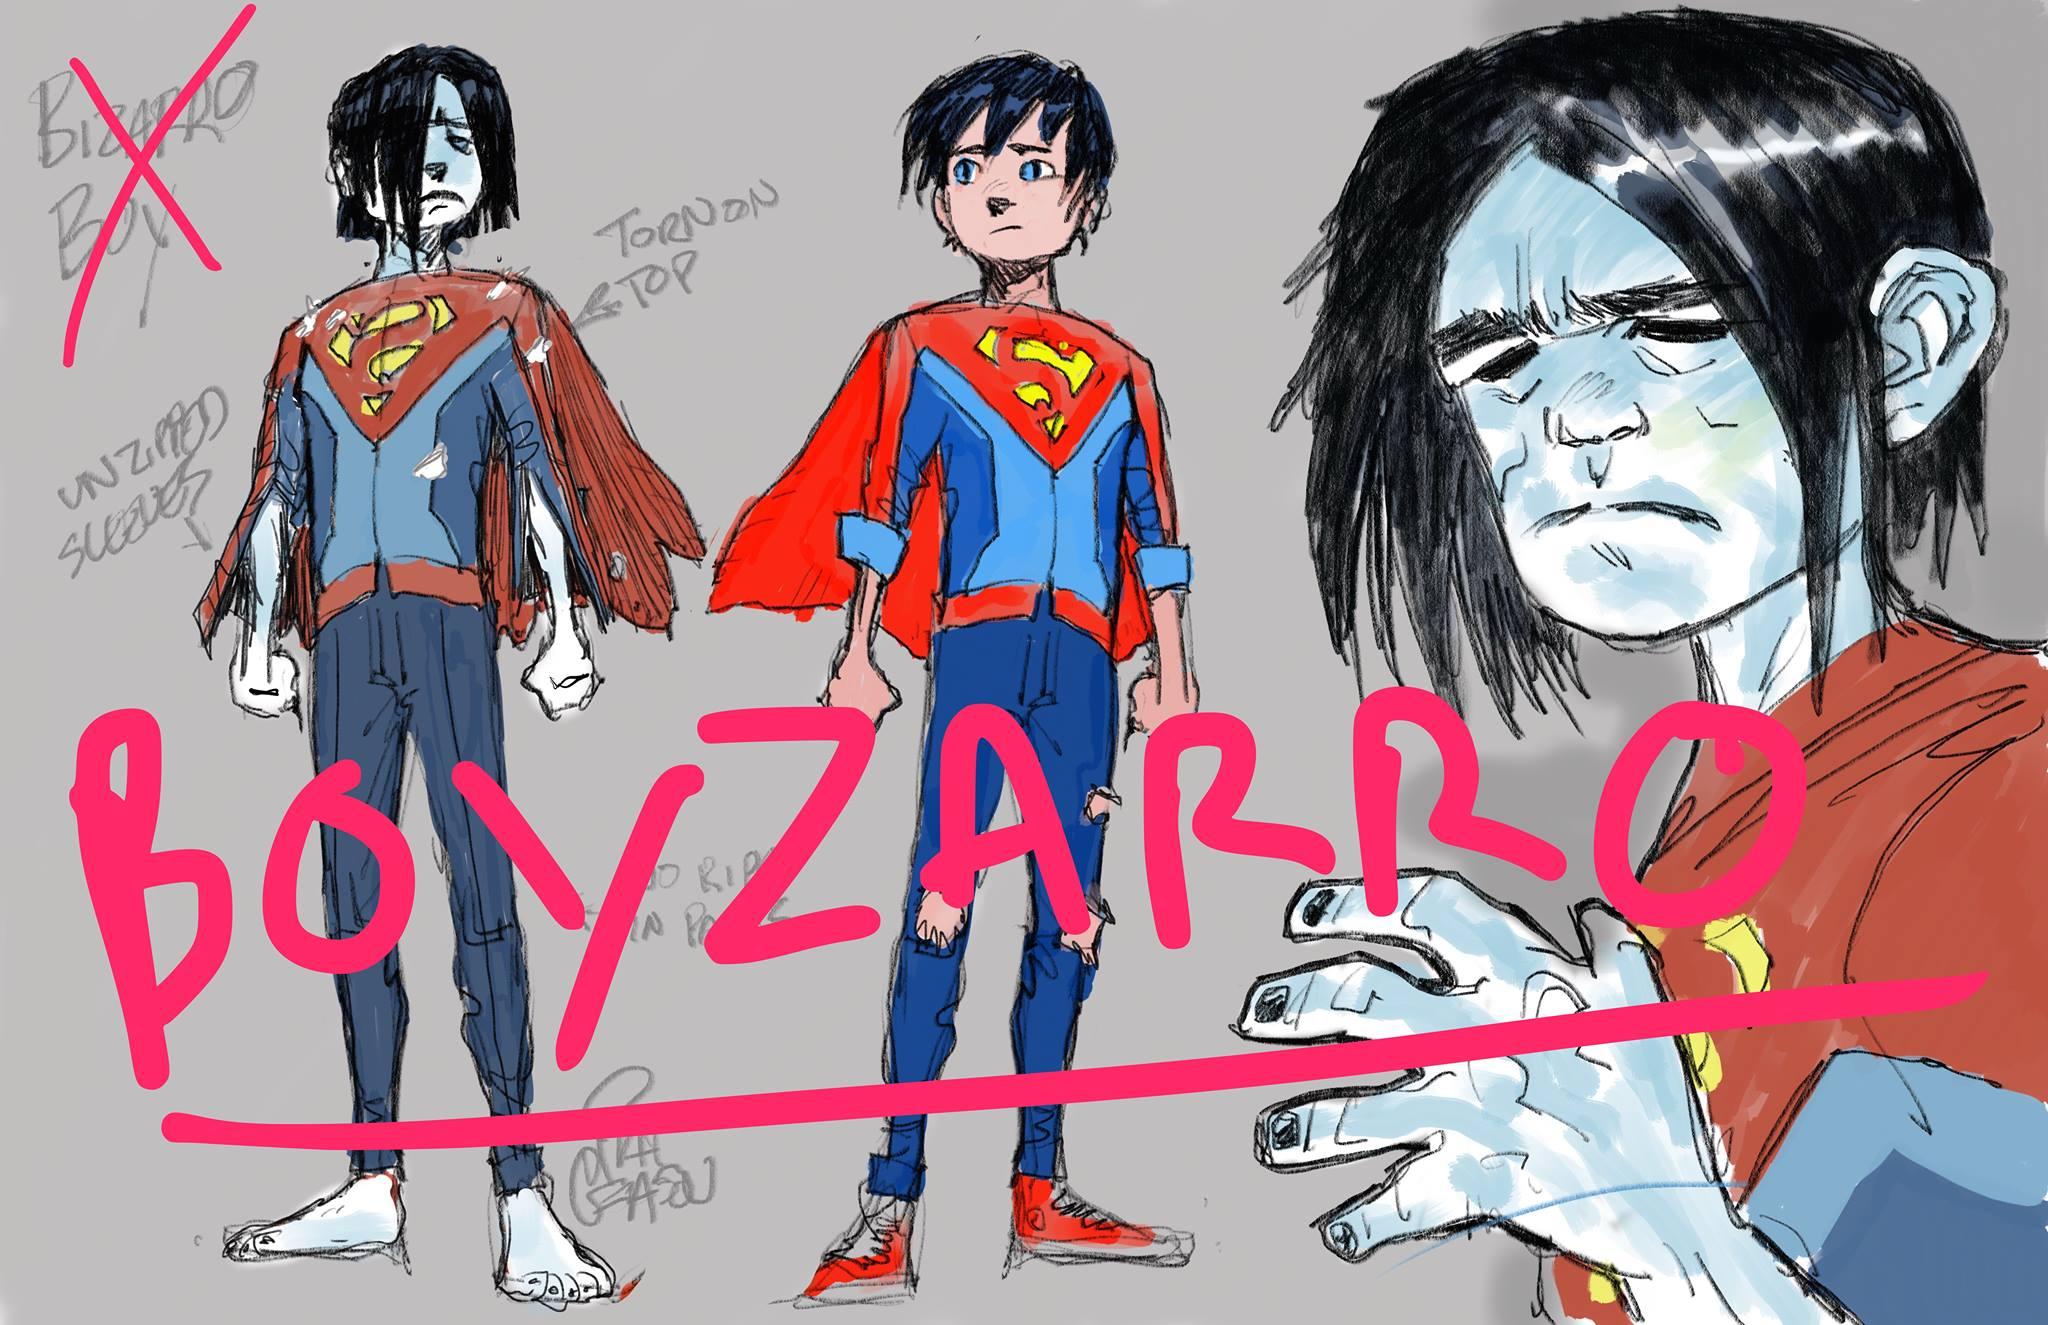 Boyzarro character design by Patrick Gleason